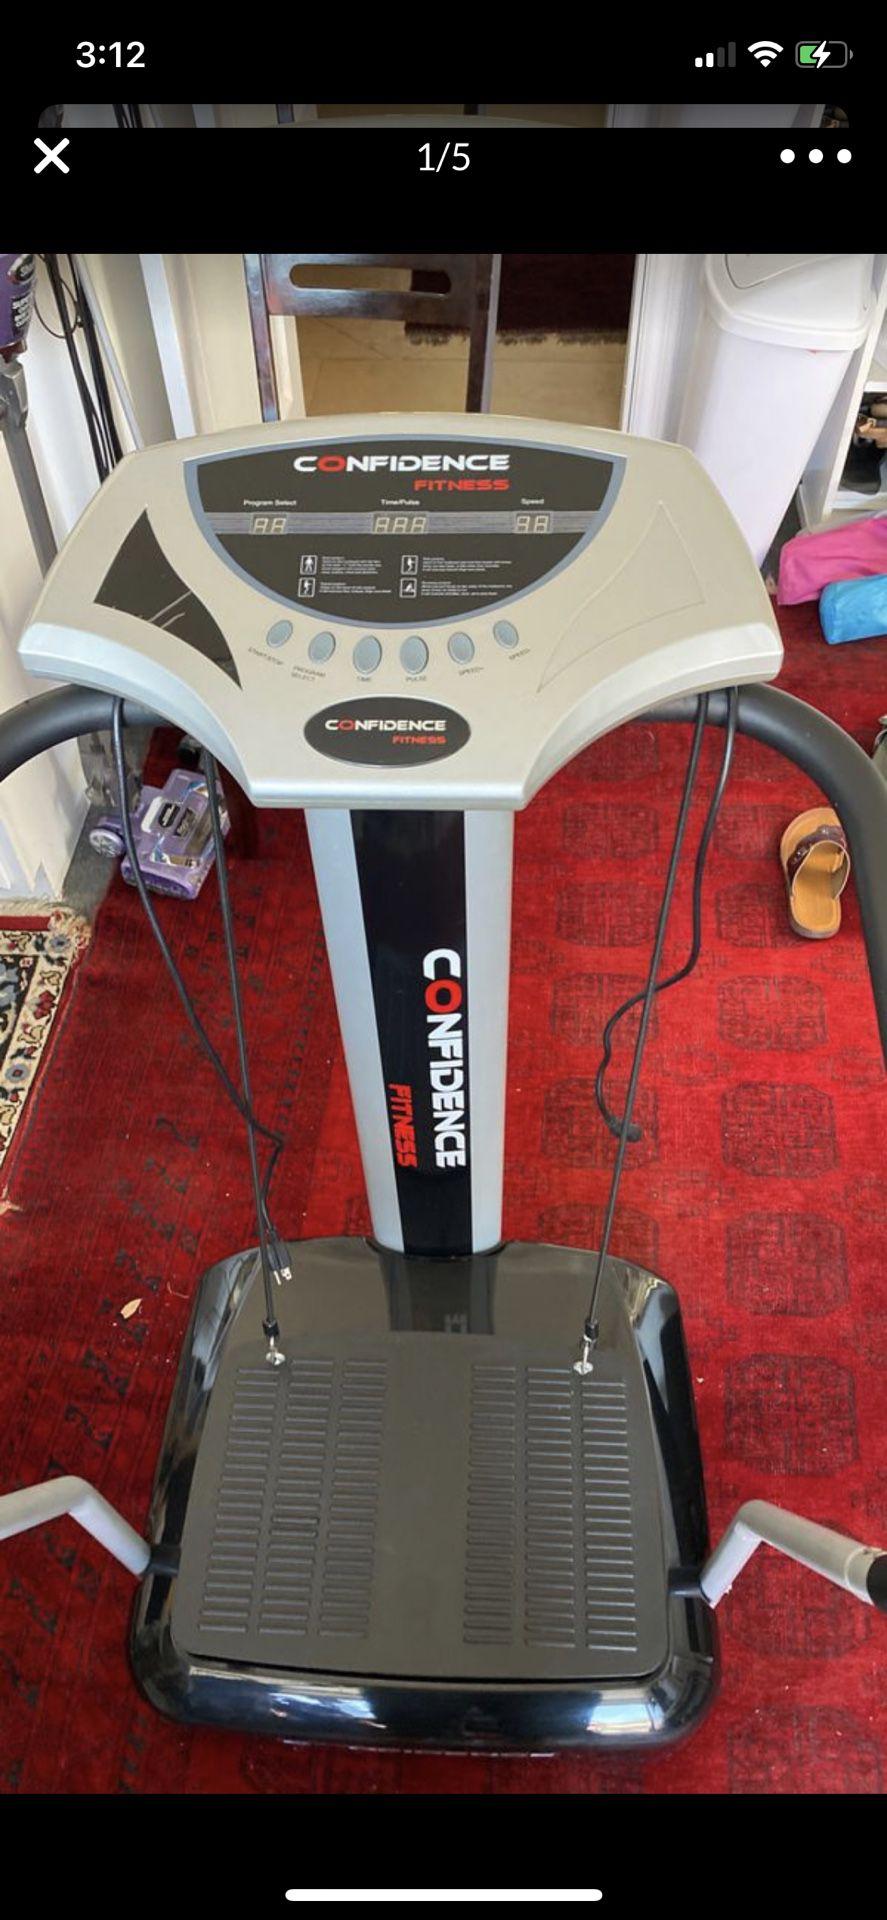 Confidence Fitness Machine